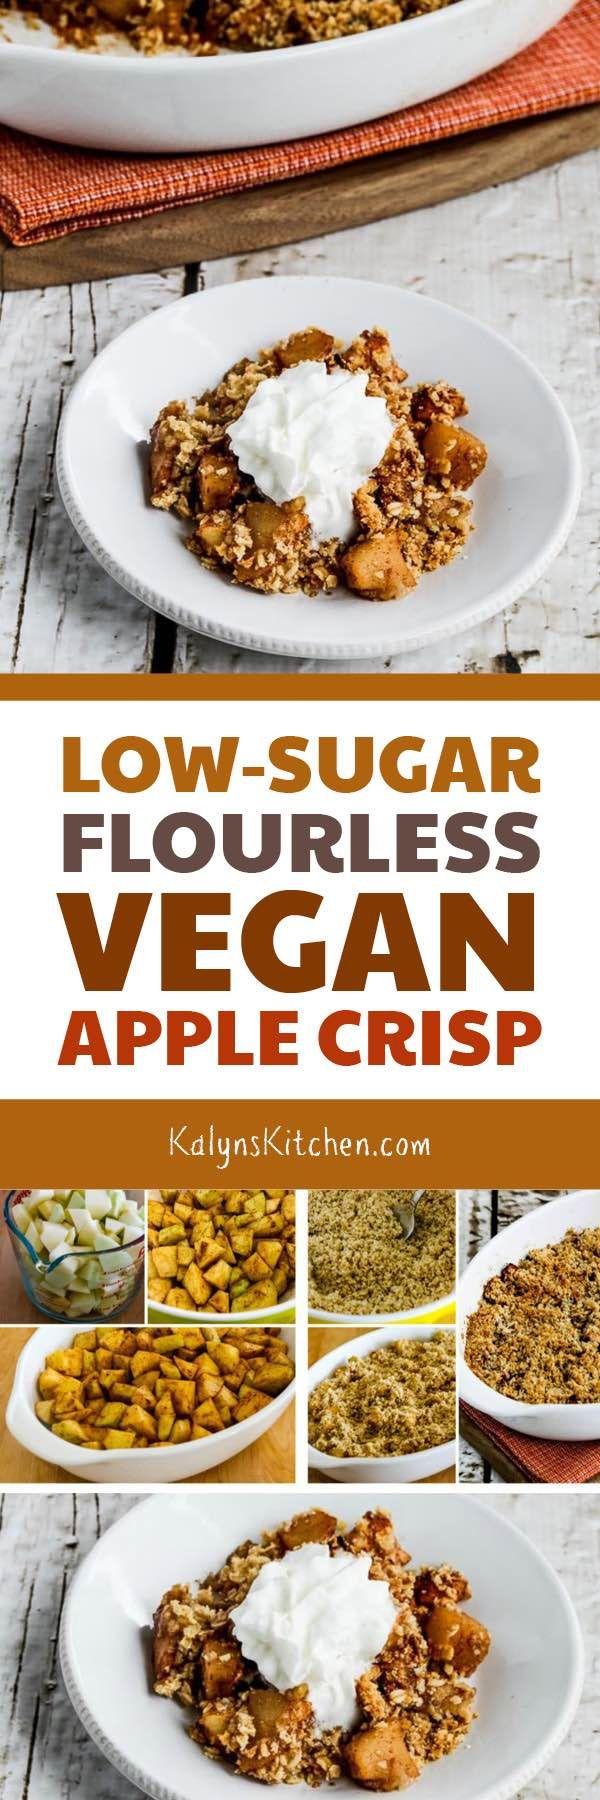 Low-Sugar Flourless Vegan Apple Crisp found on KalynsKitchen.com